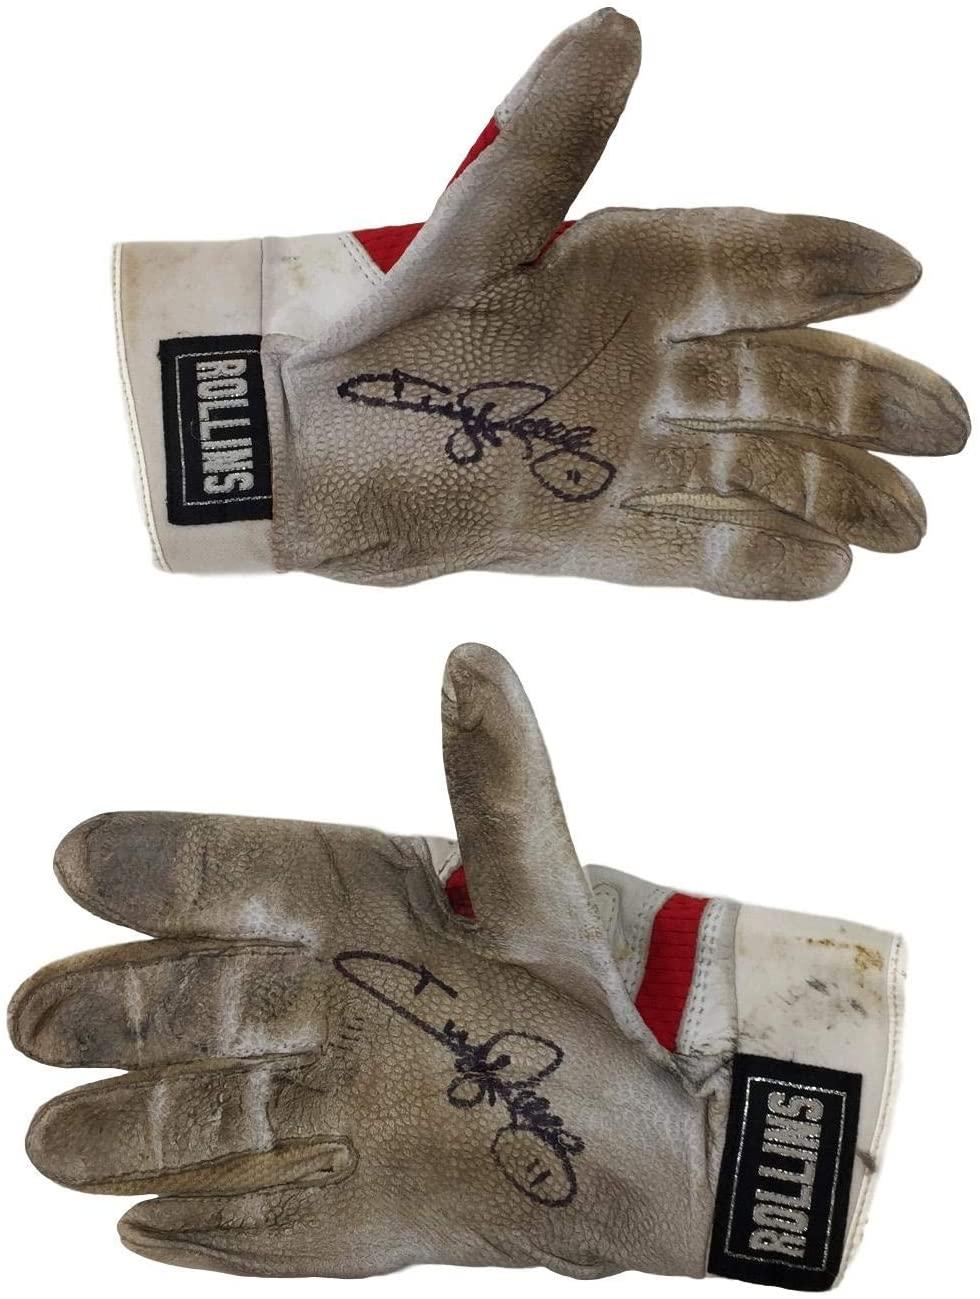 Jimmy Rollins Signed Game Used Philadelphia Phillies Nike Batting Gloves 7 BAS+Rollins LOA